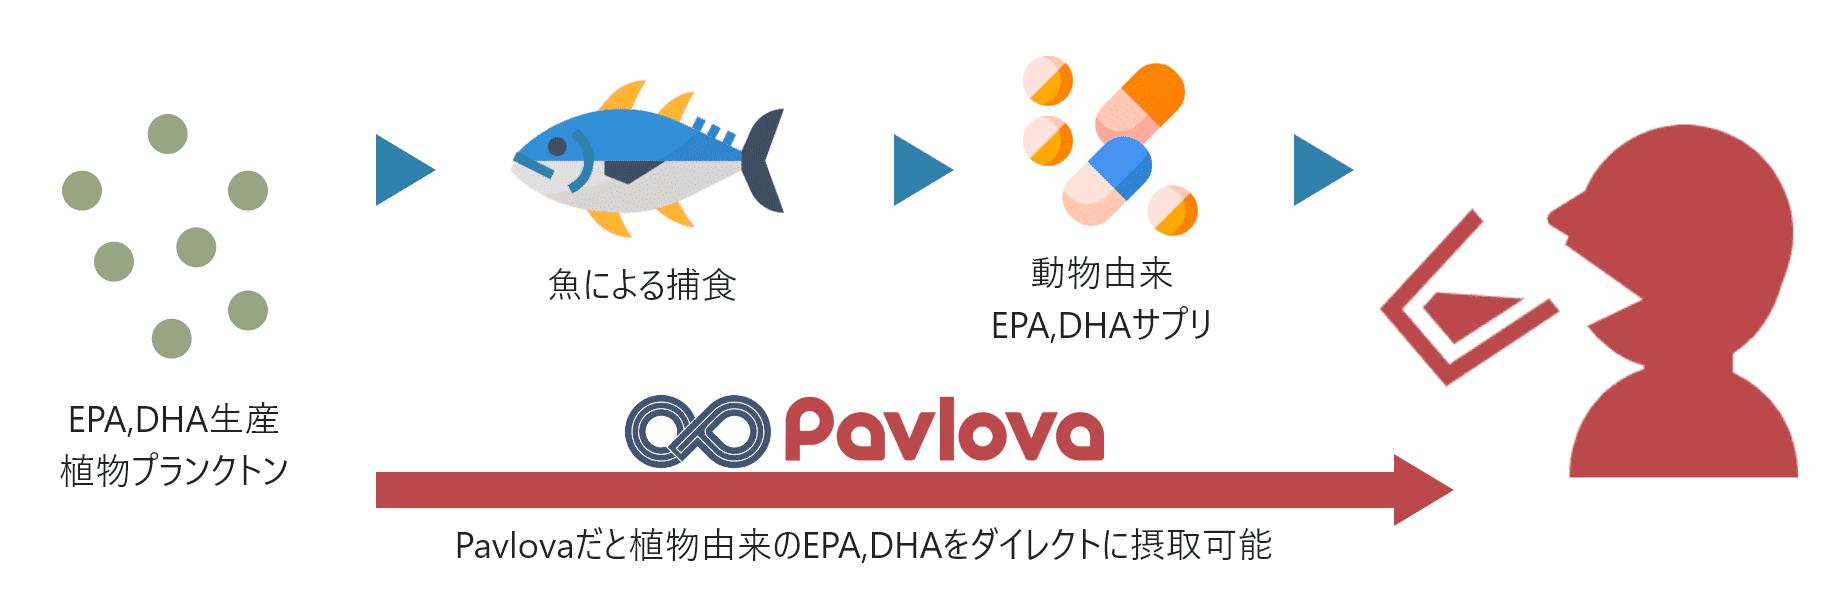 Pavlovaだと植物由来のEPA,DHAをダイレクトに摂取可能